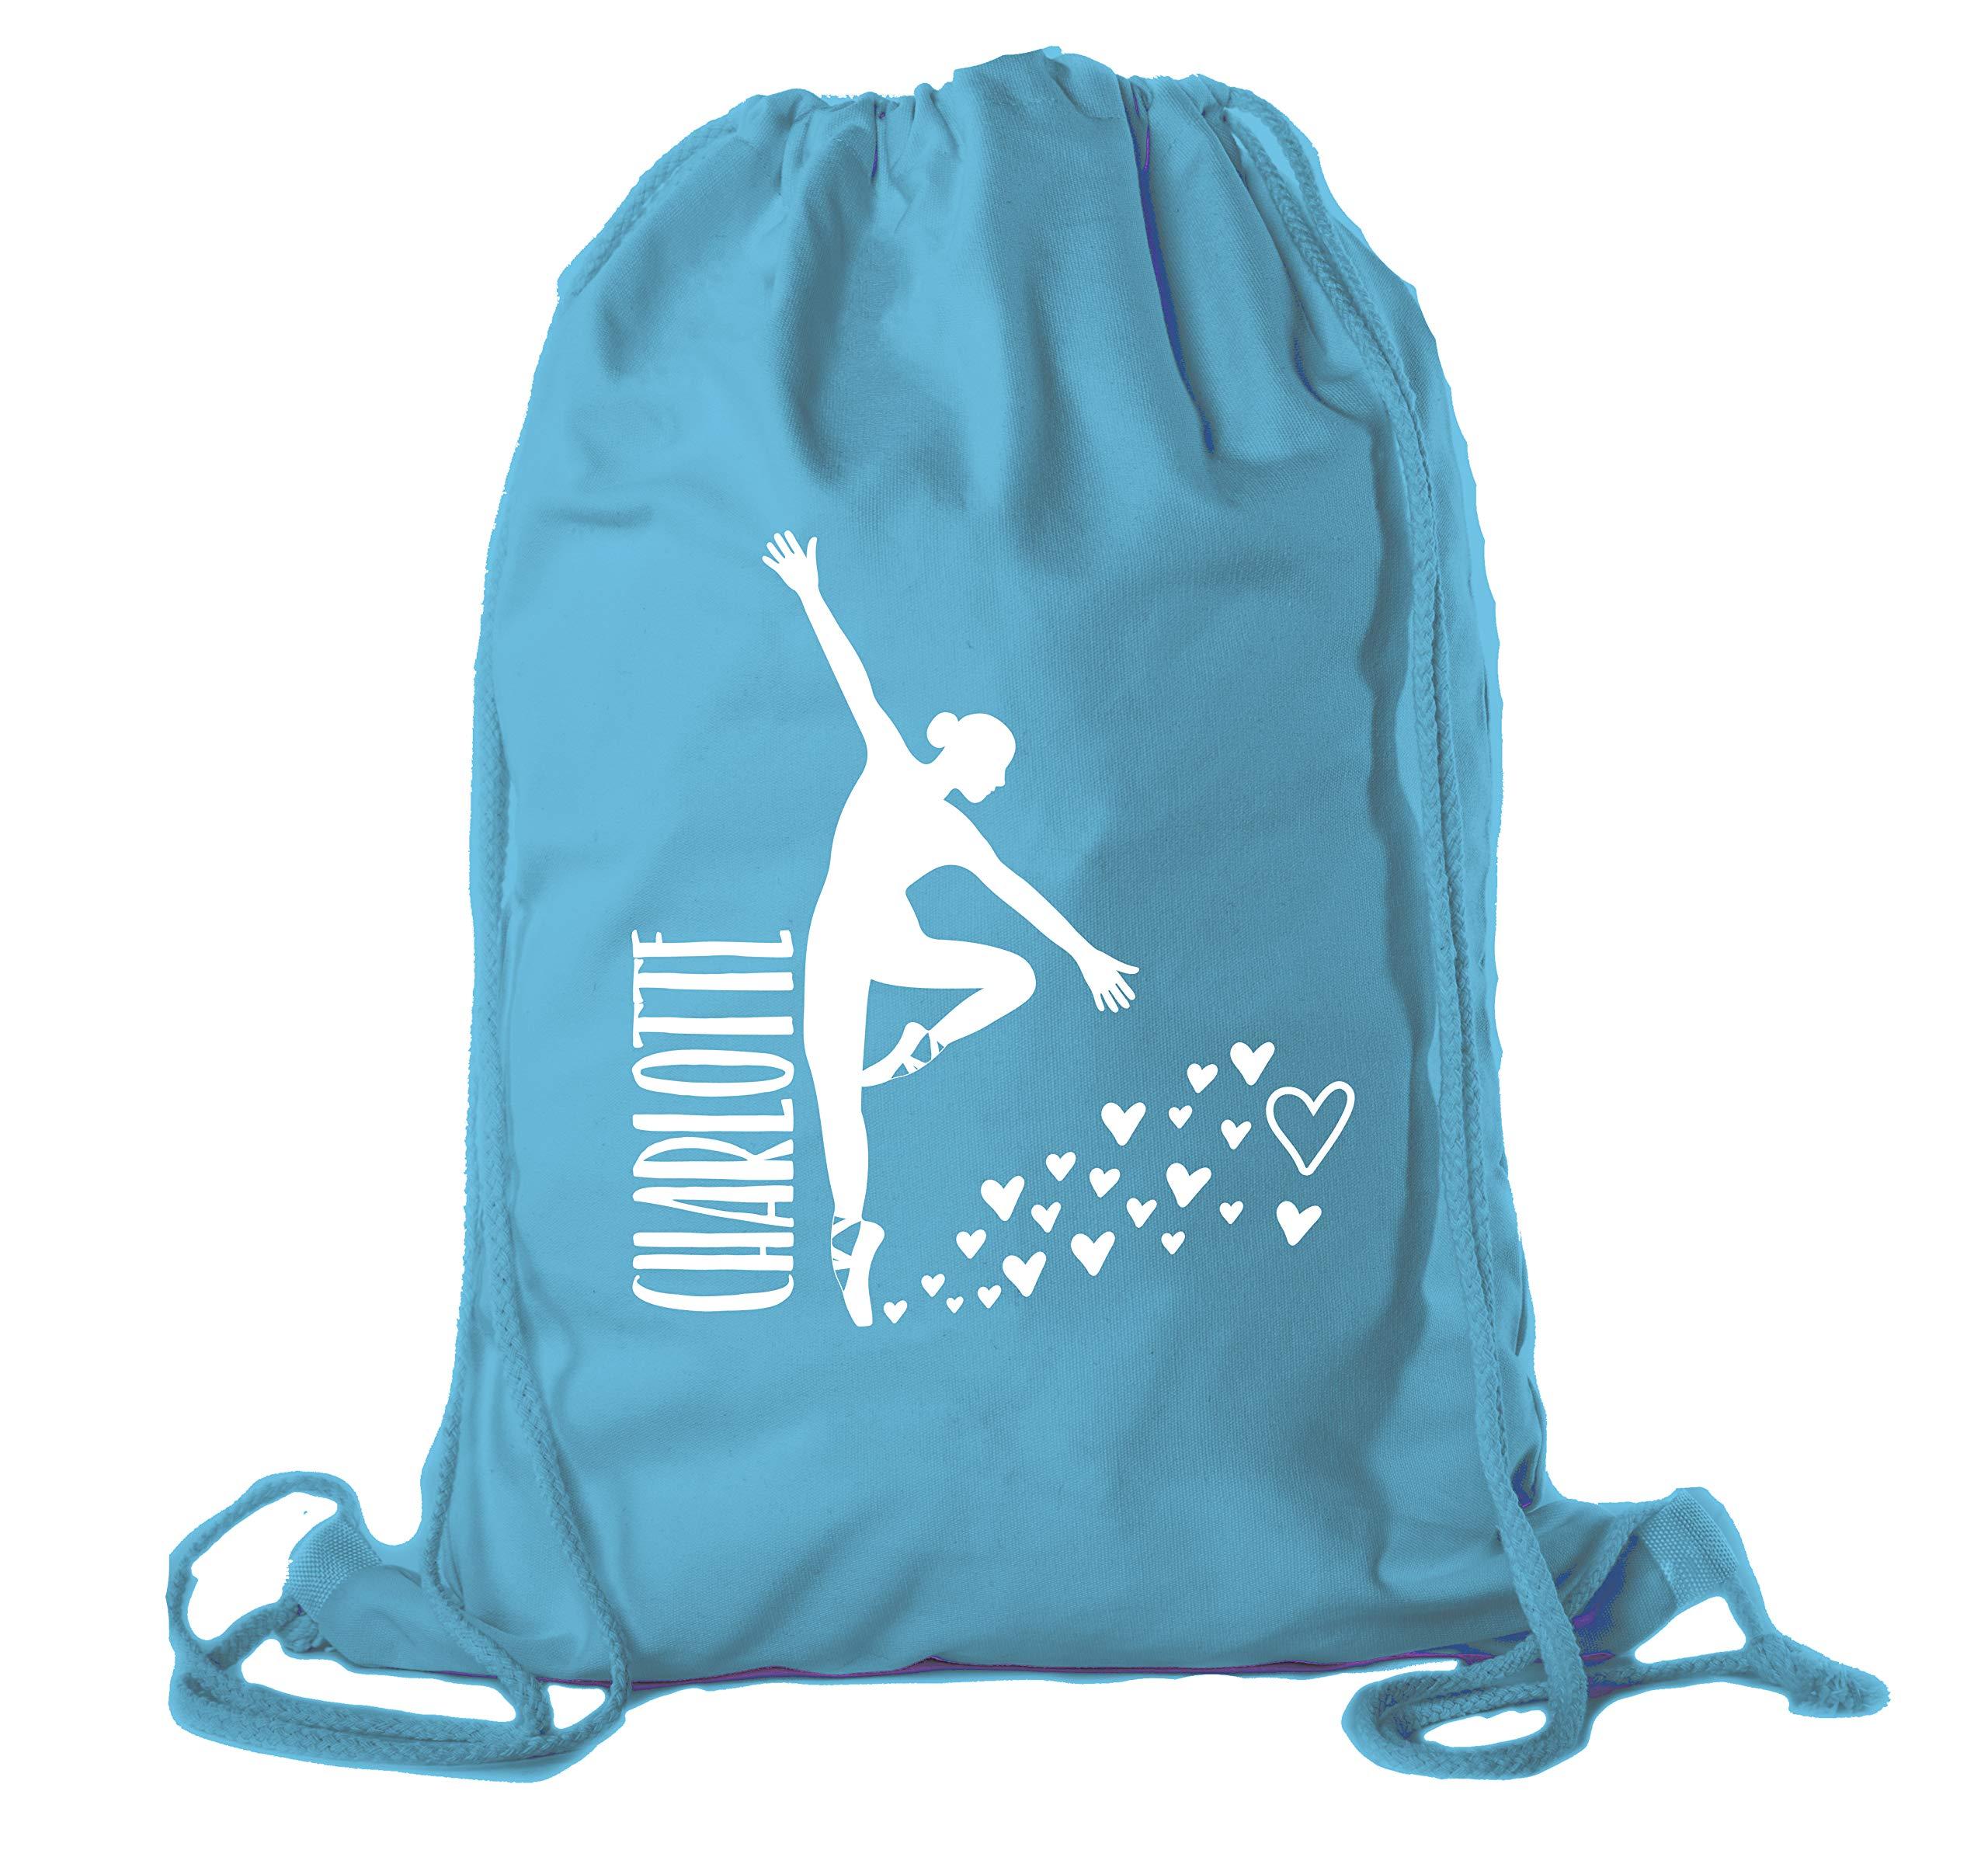 Personalized Dance Bags, Ballet Drawstring Backpack, Dance Backpacks for Girls - 10PK Watermelon CE2725Dance S5